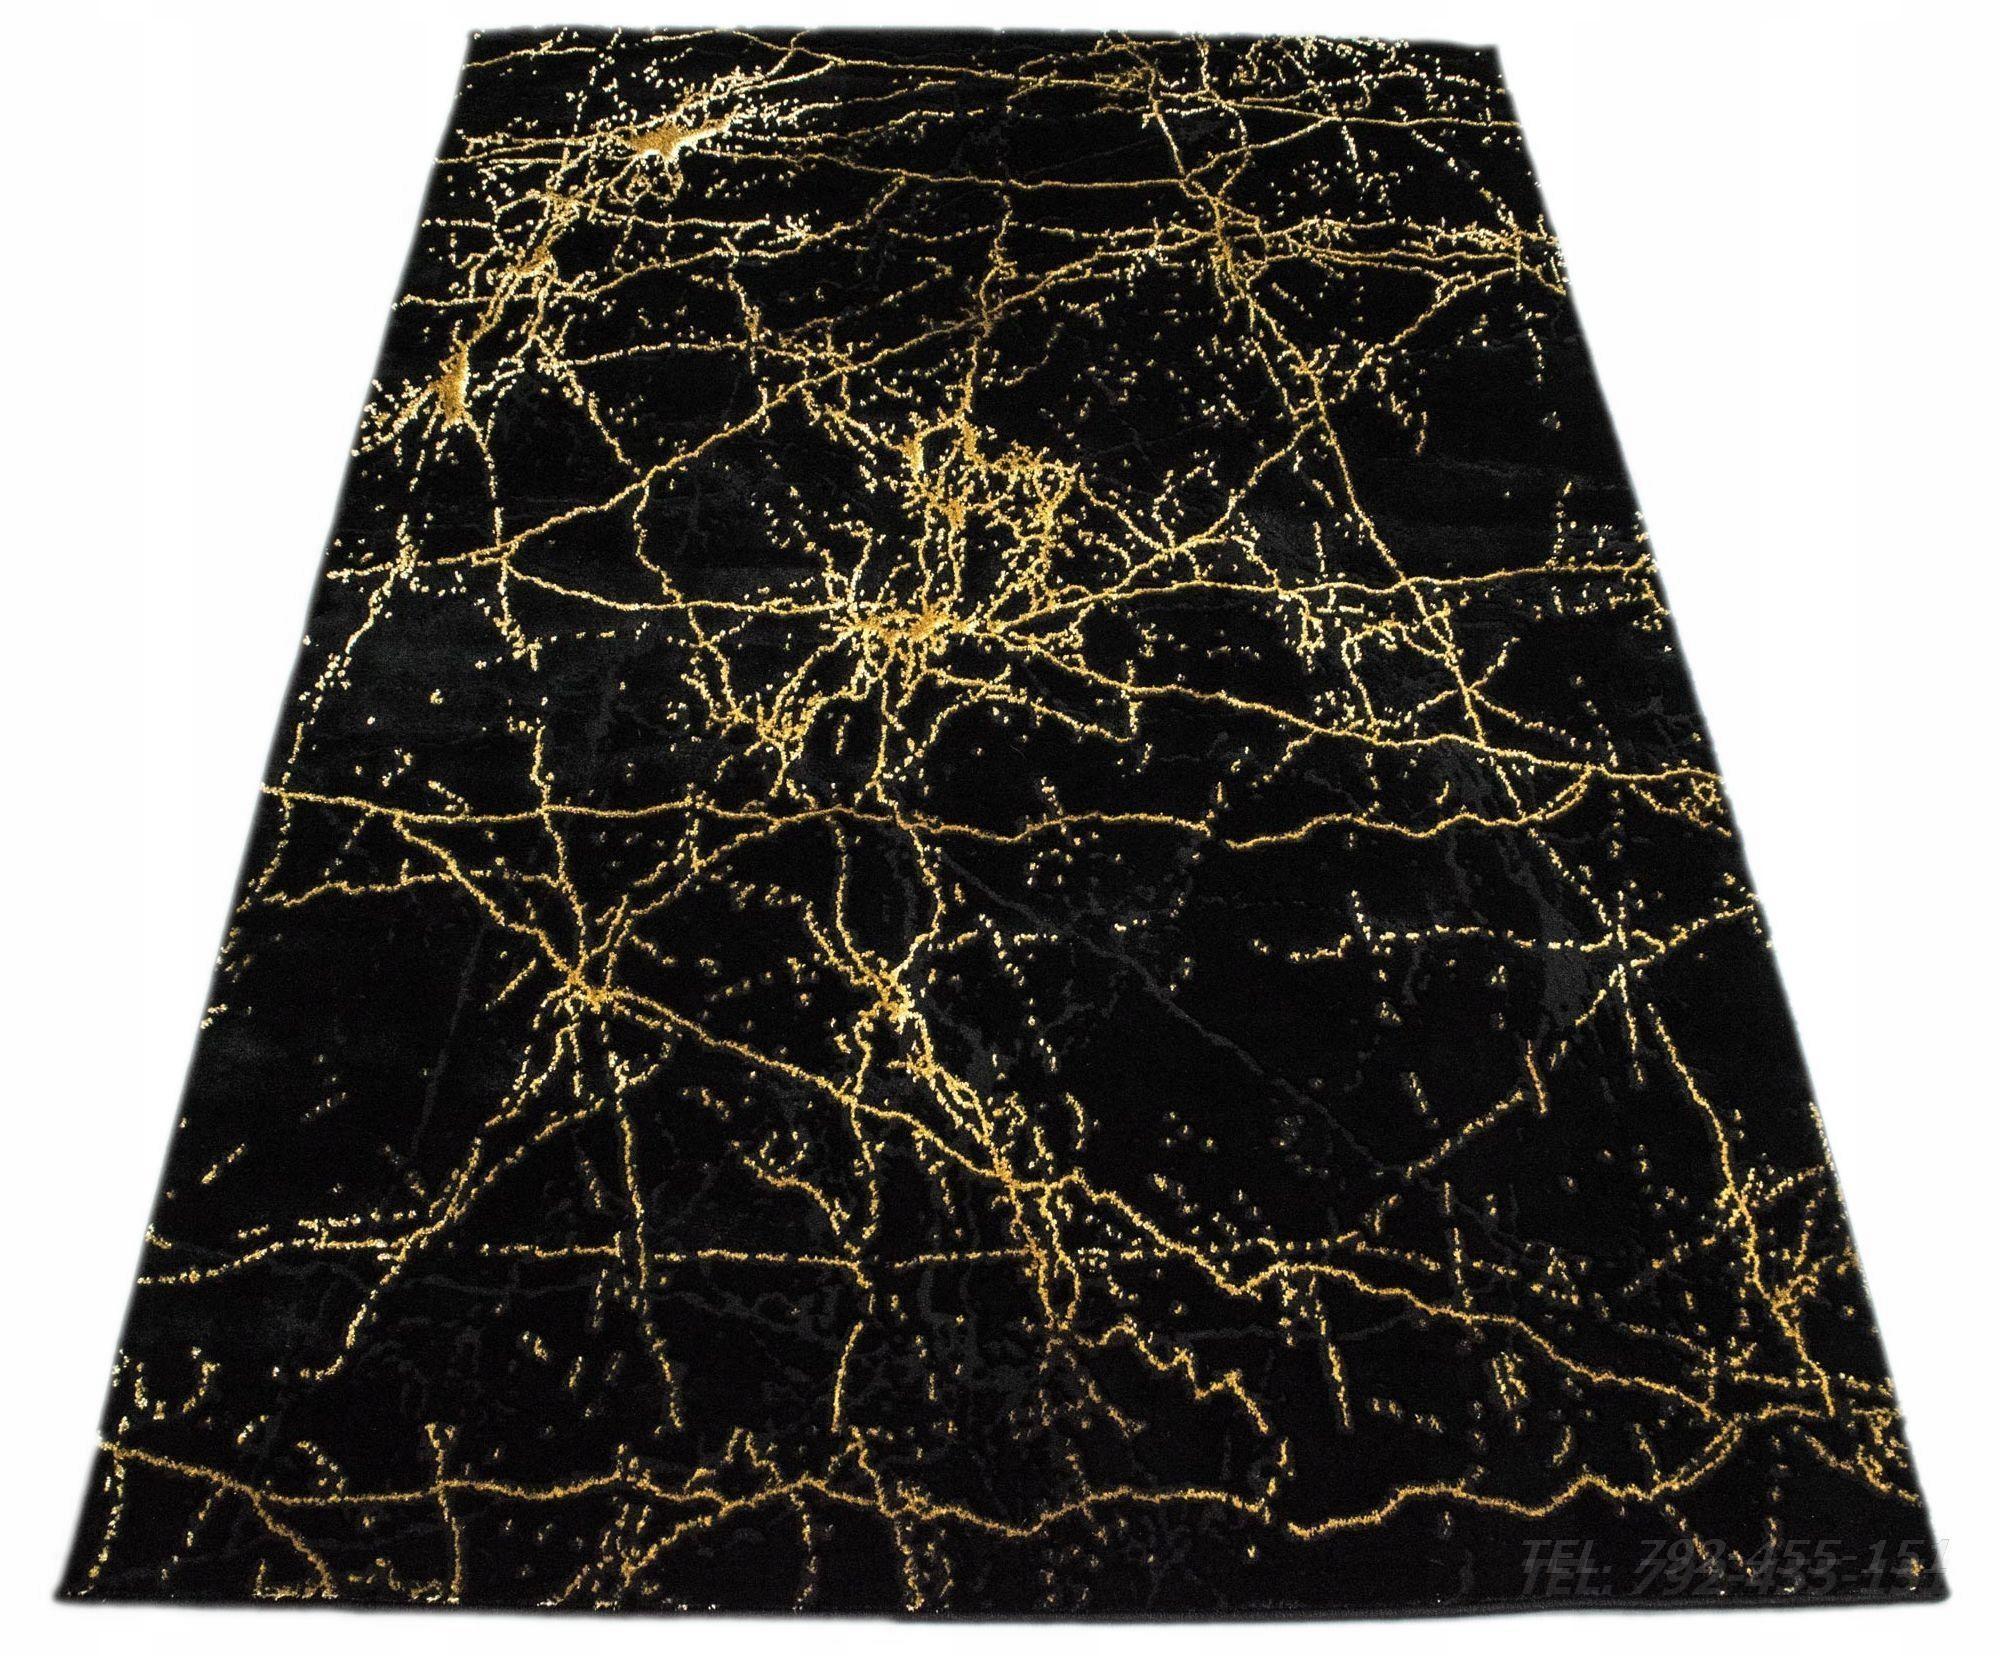 Ковер BLACK GOLDEN MARBLE 180x260 GLAMOUR DELUXE